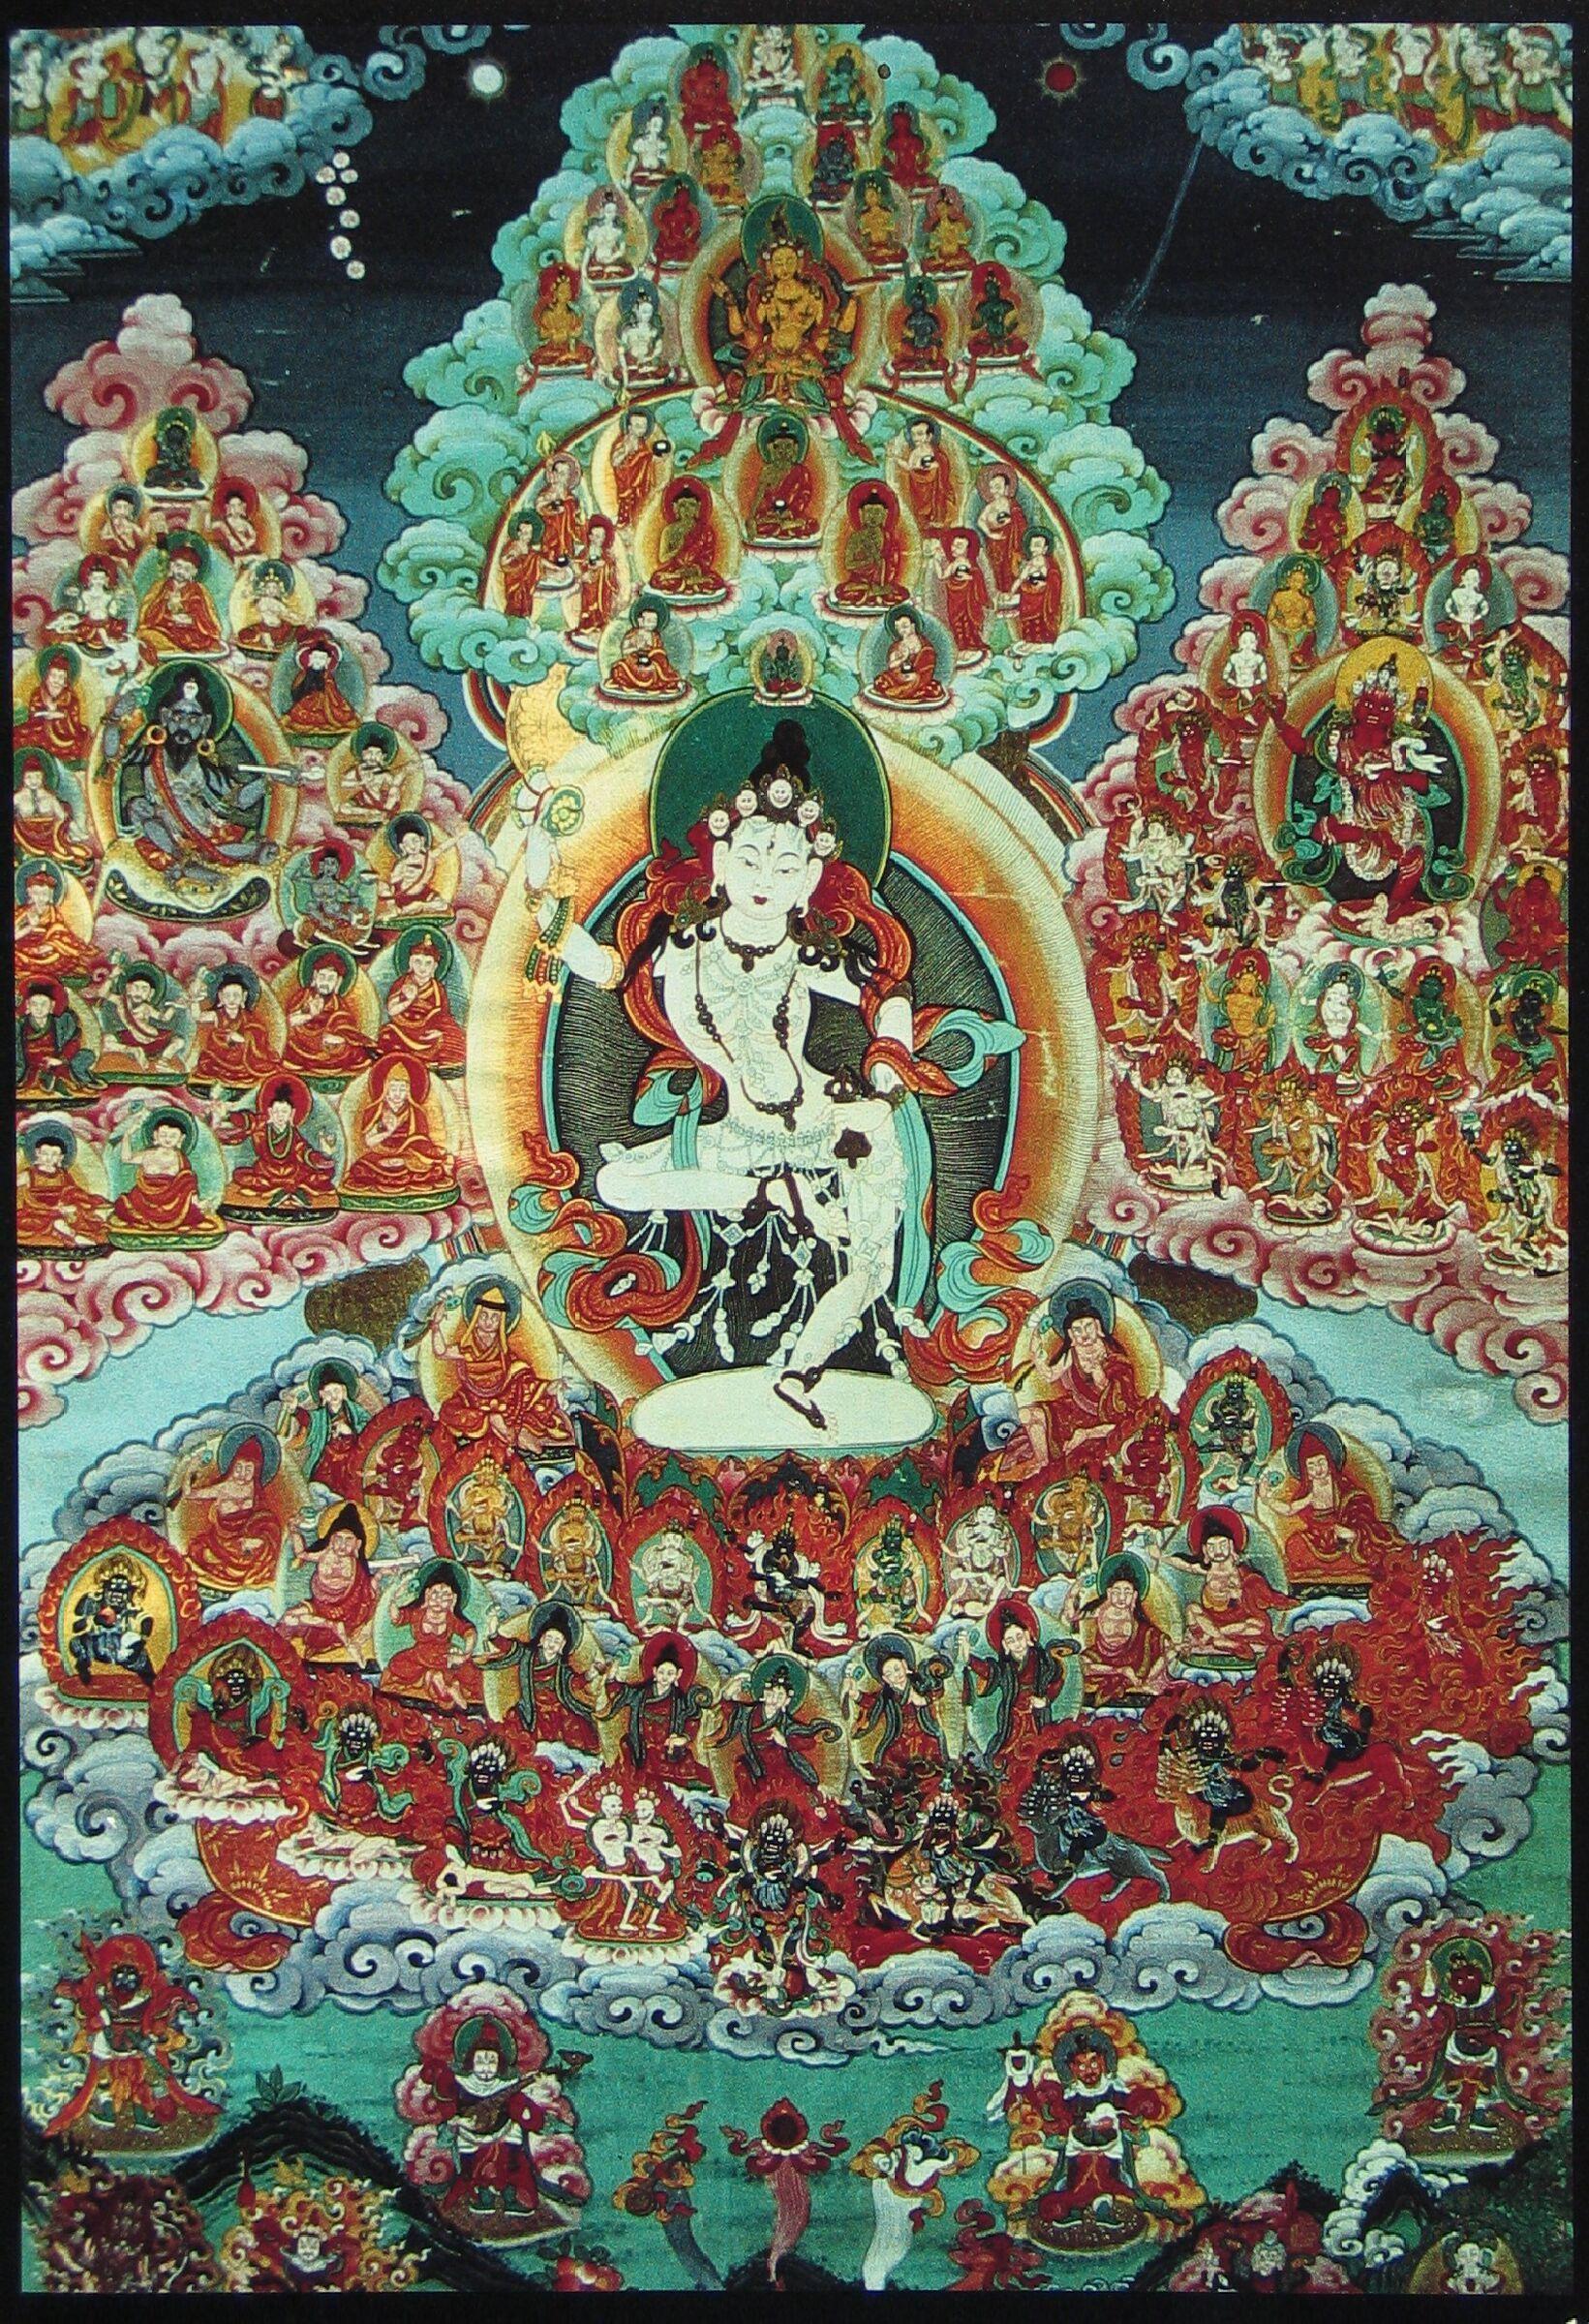 Machig Labdrön 11th-century Tibetan tantric Buddhist